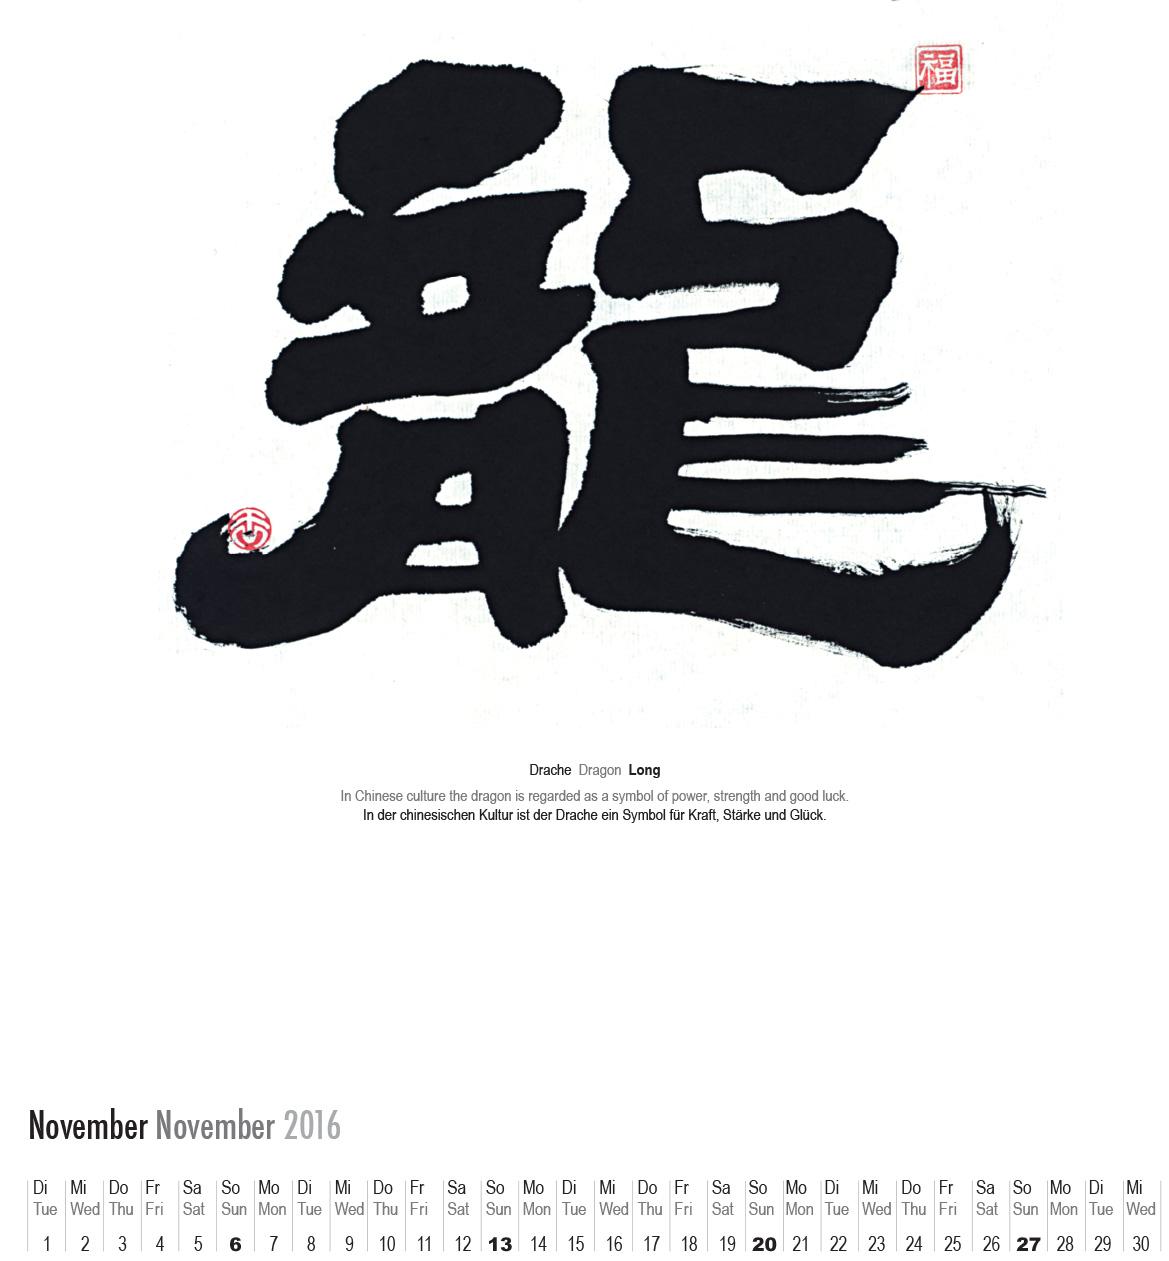 2016 tai chi calendar taiji forum 2016 tai chi calendar biocorpaavc Image collections